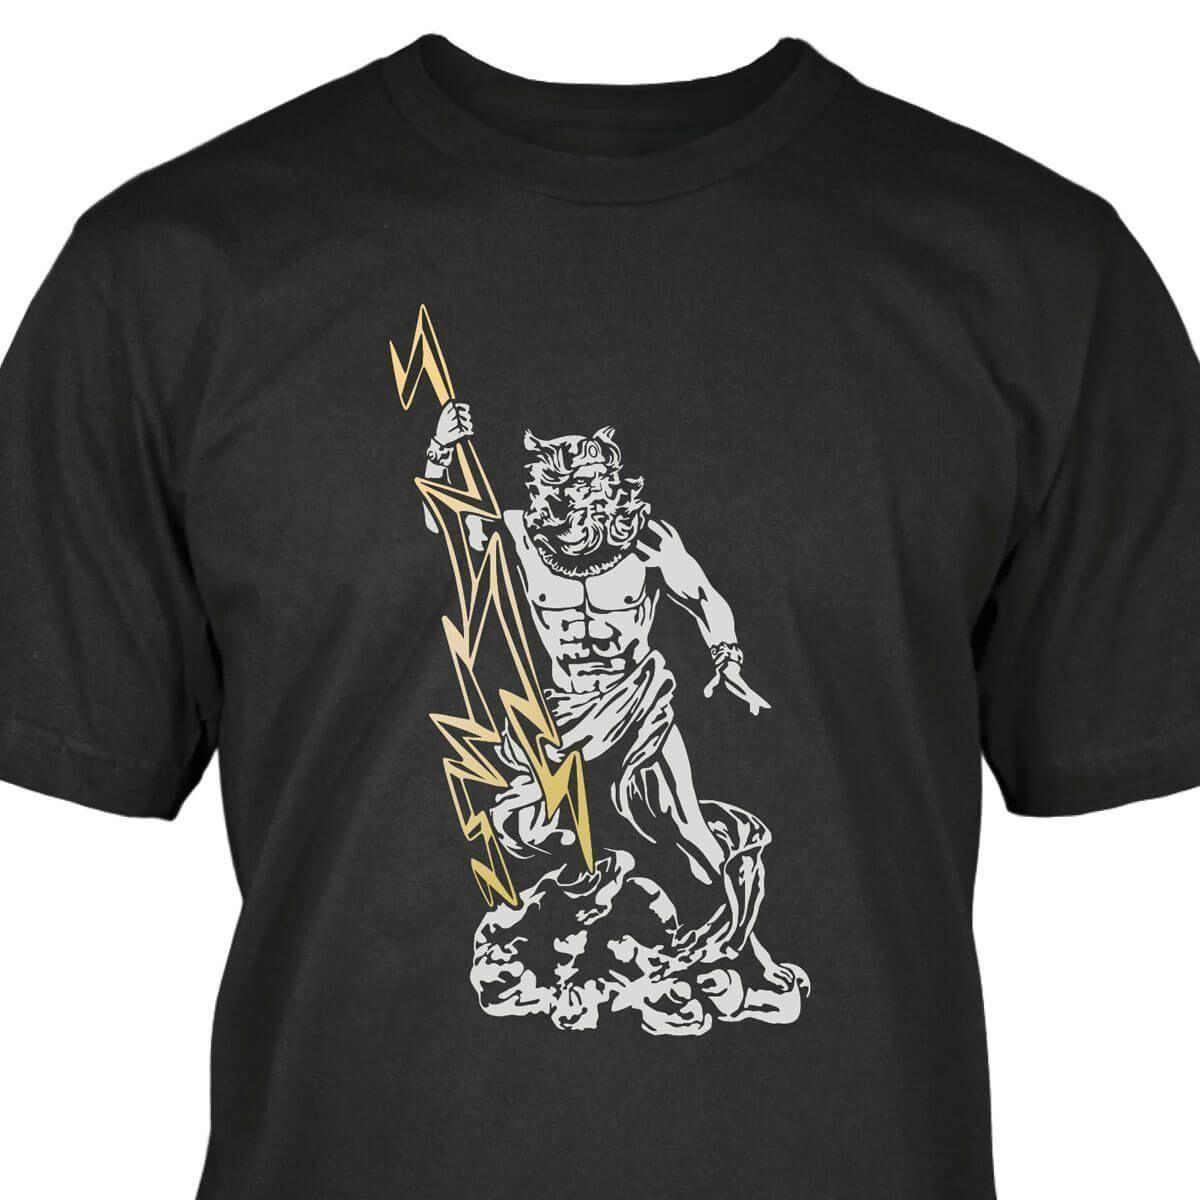 72892671b03 Zeus T Shirt Mens 2018 Fashion Brand T Shirt O Neck 100%cotton T Shirt Tops Tee  Custom Environmental Printed Tshirt Male Hip Hop Funny Coolest Tee Shirts  ...